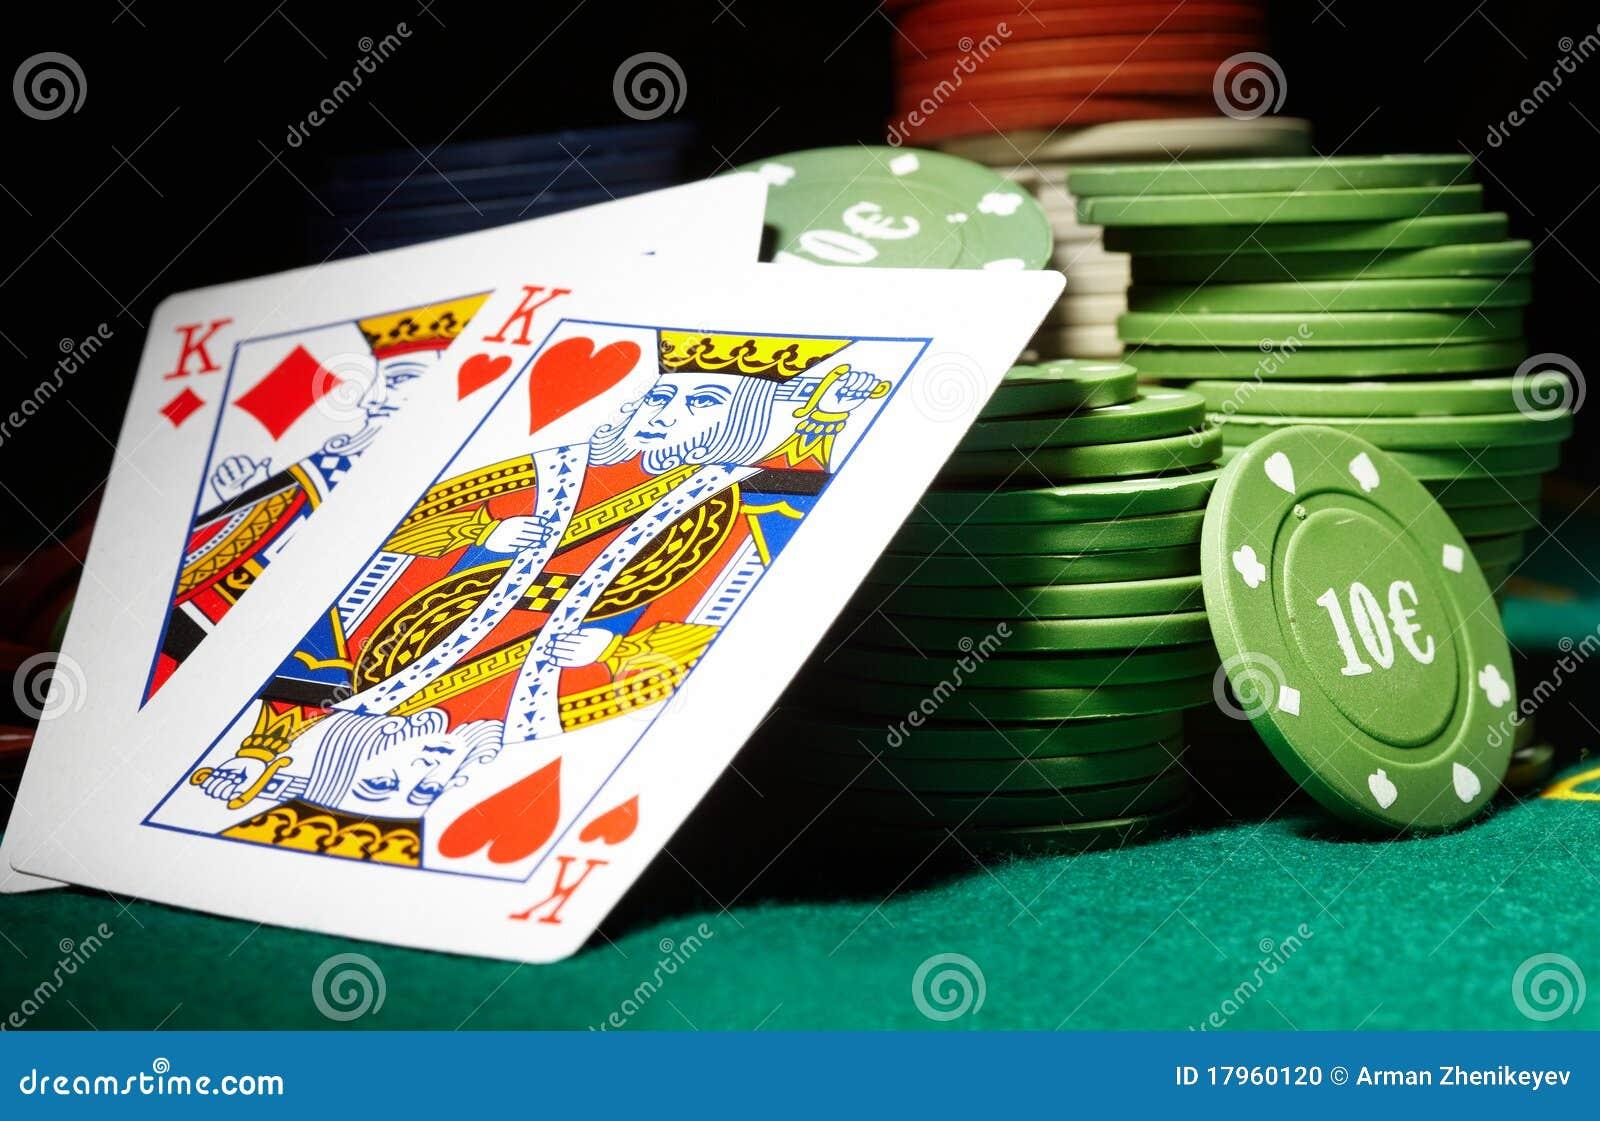 Ztema poker